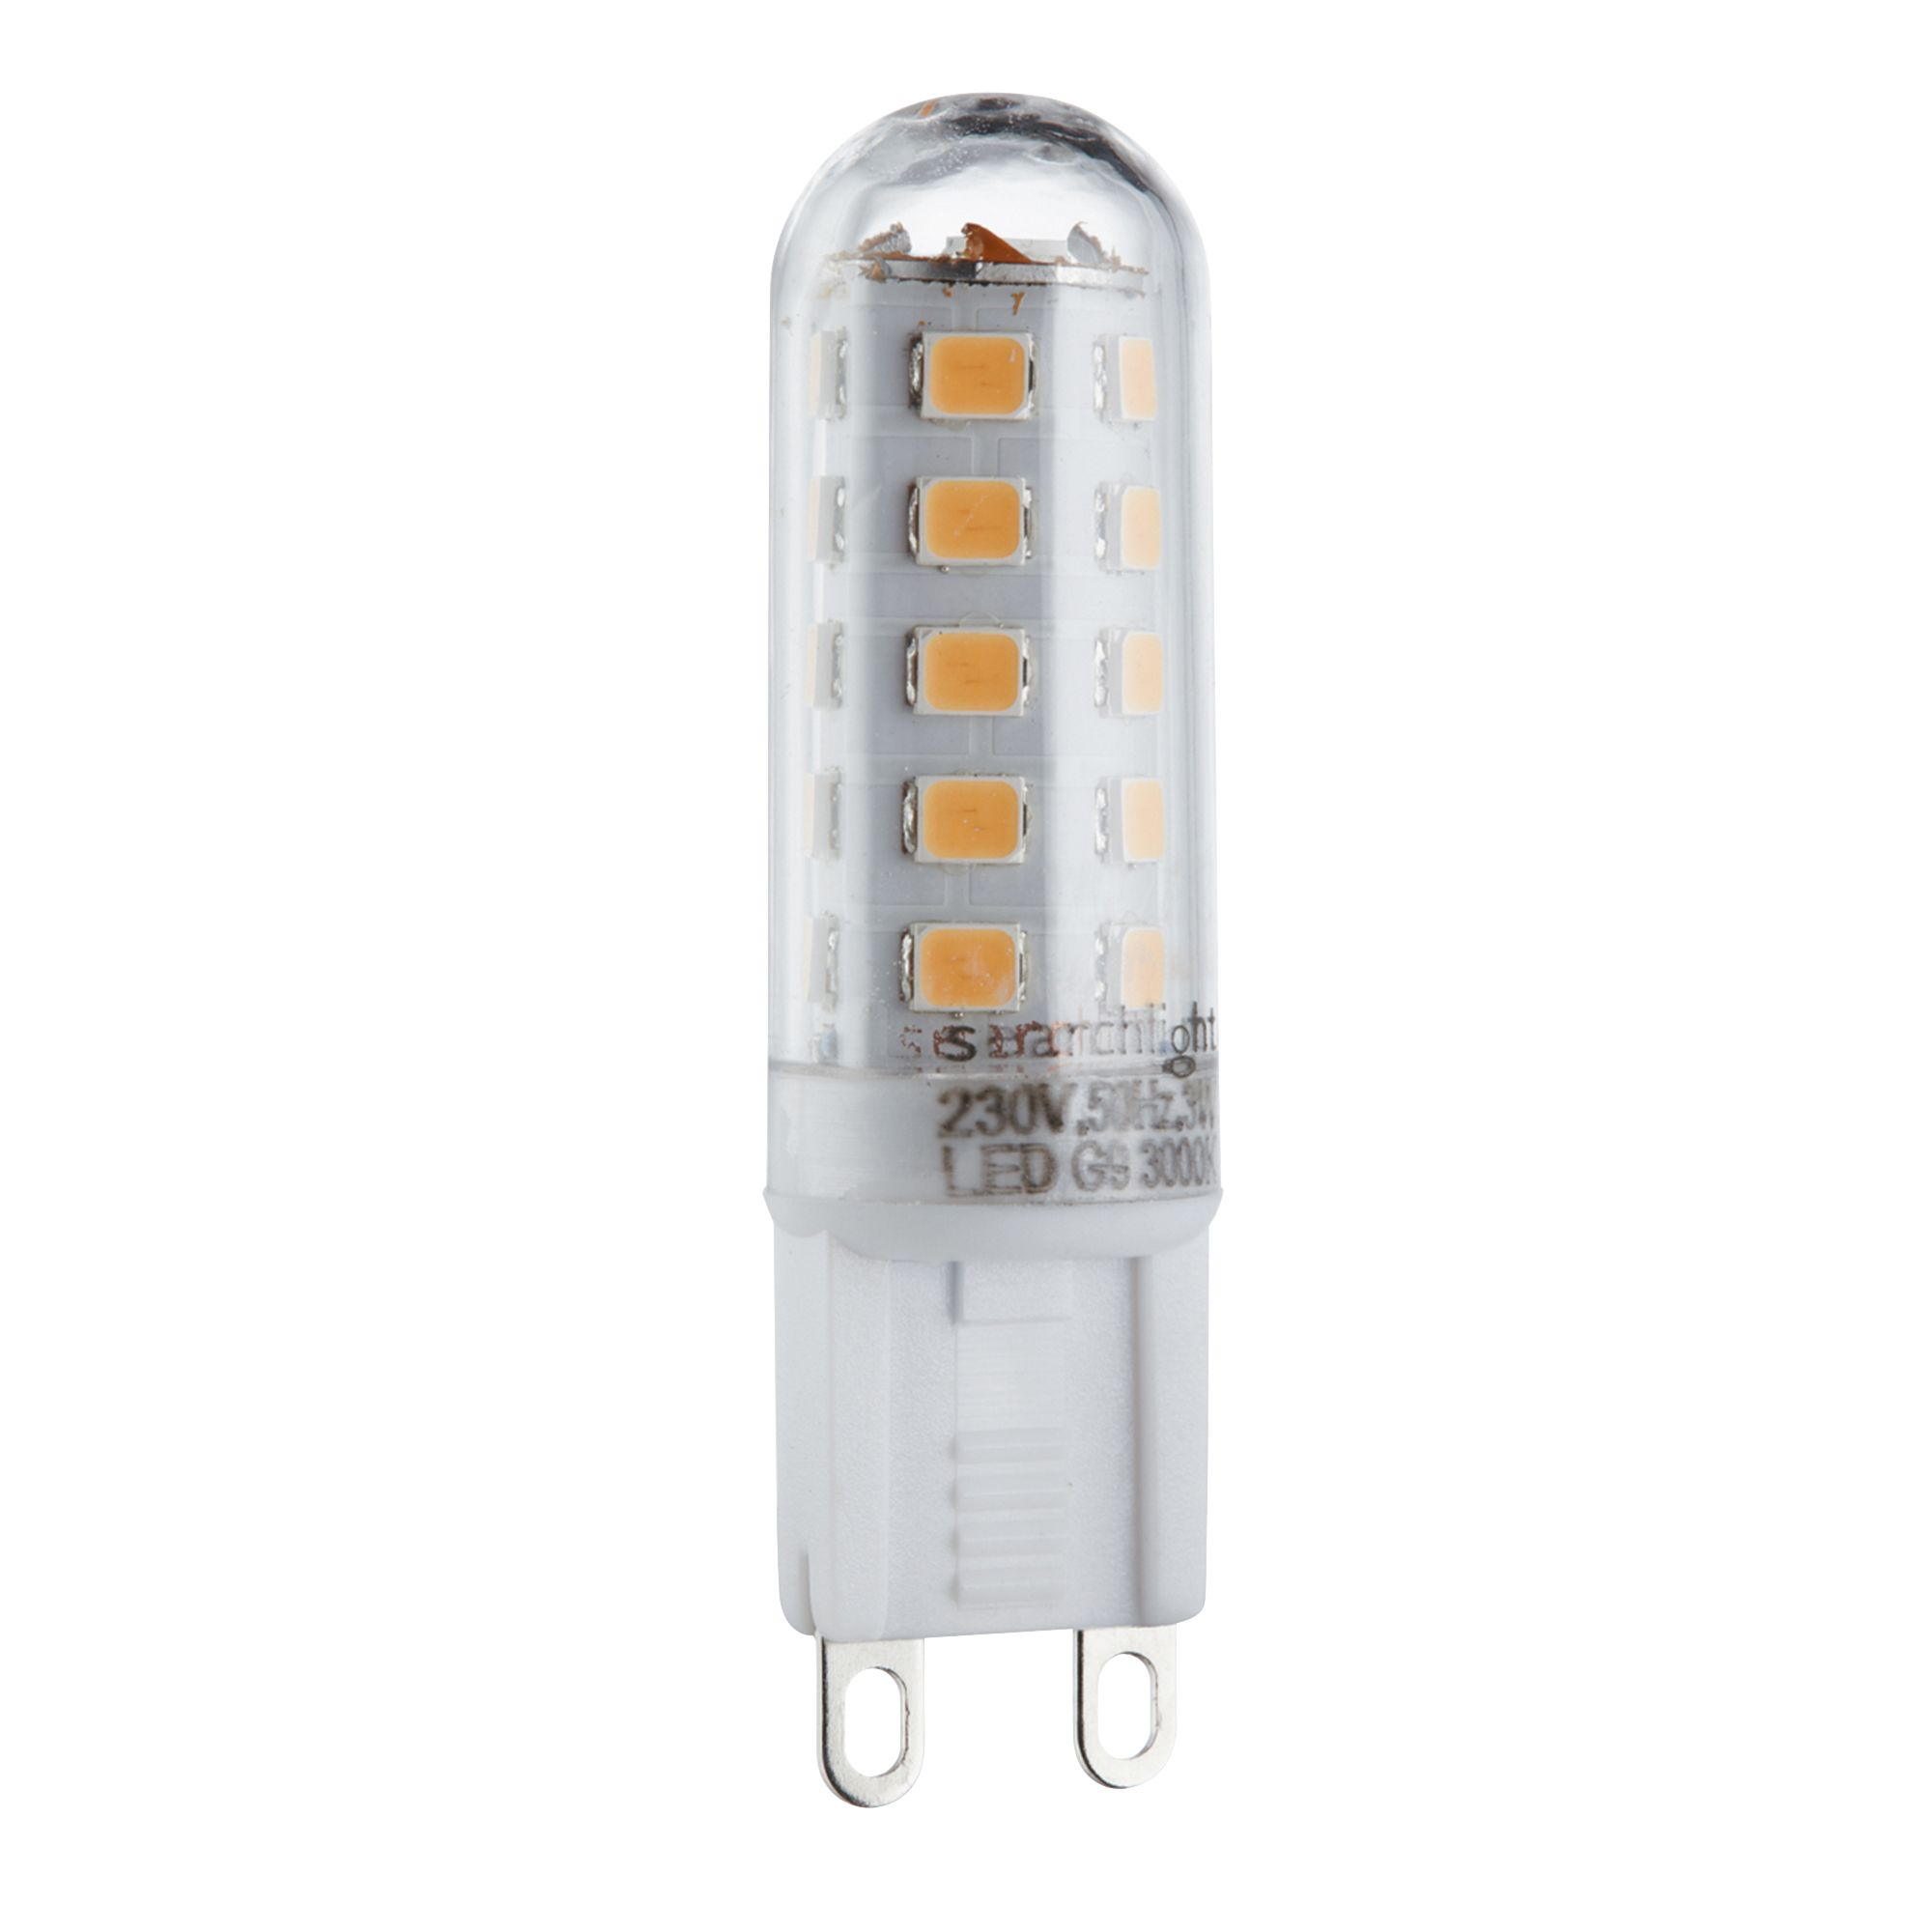 G9 Led Bulb - 3w, 300 Lumens, Warm White